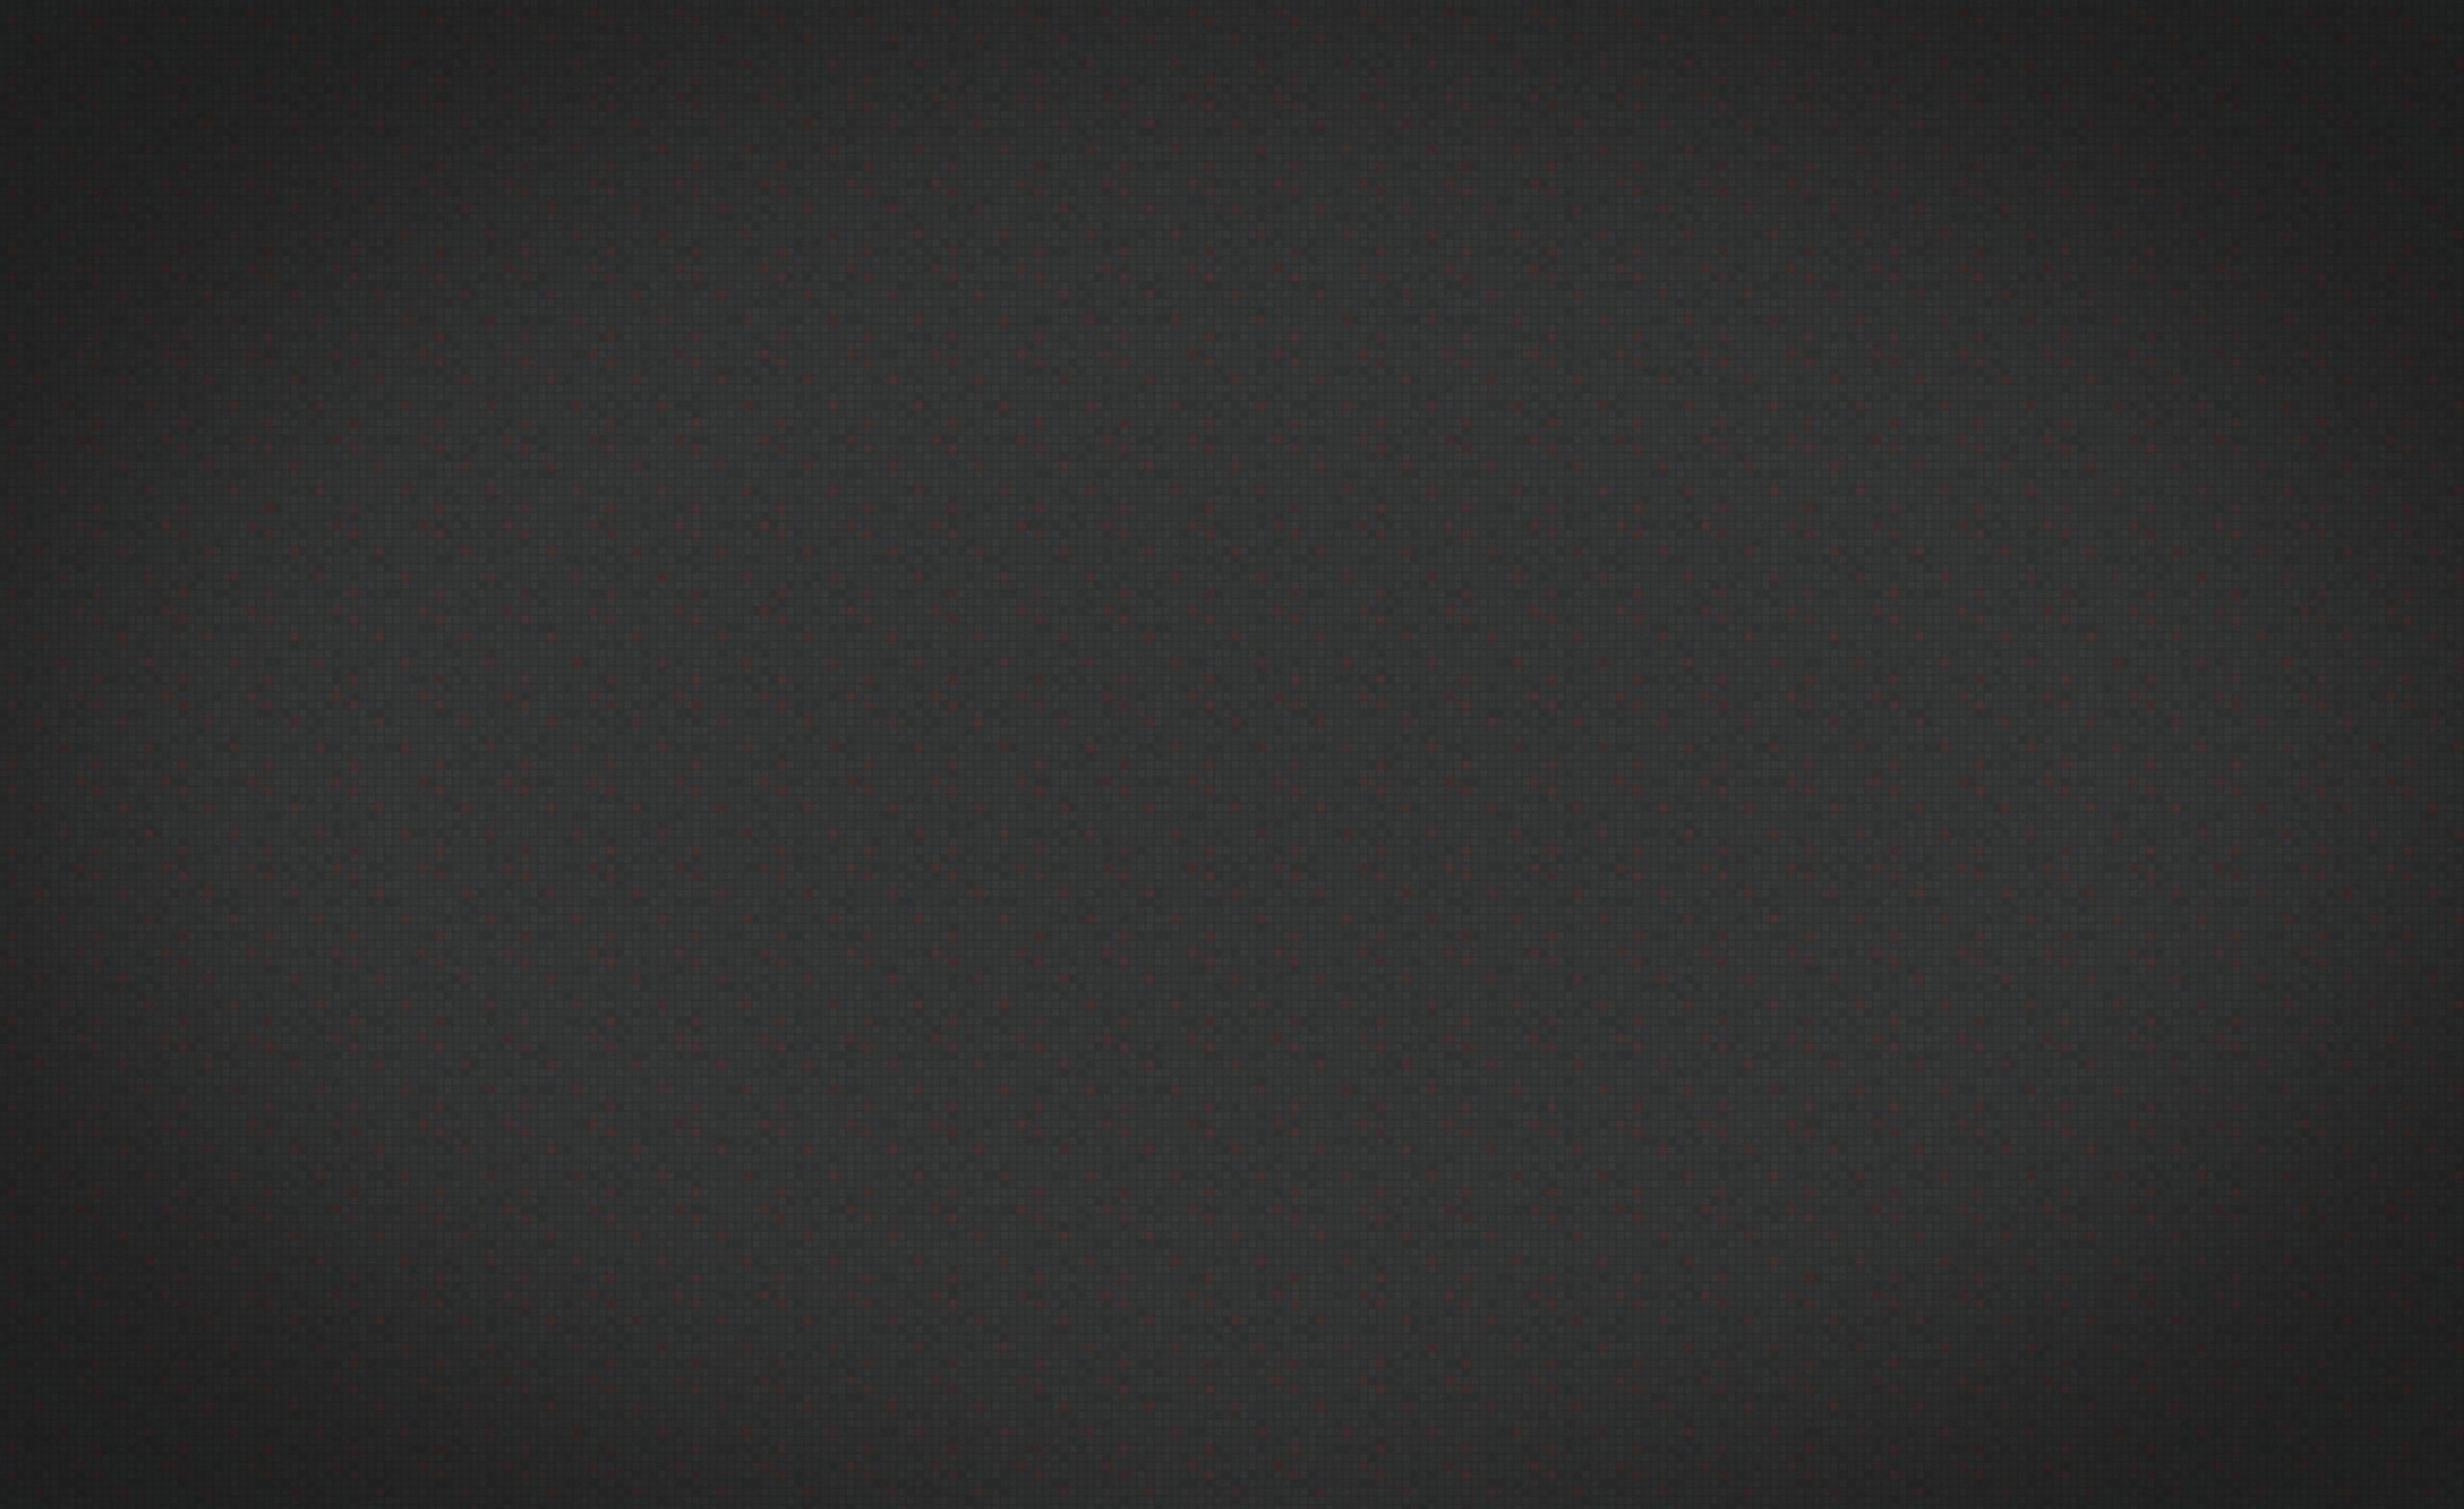 wallpaper.wiki-Pixel-art-pattern-gray-wallpaper-2560×1600-